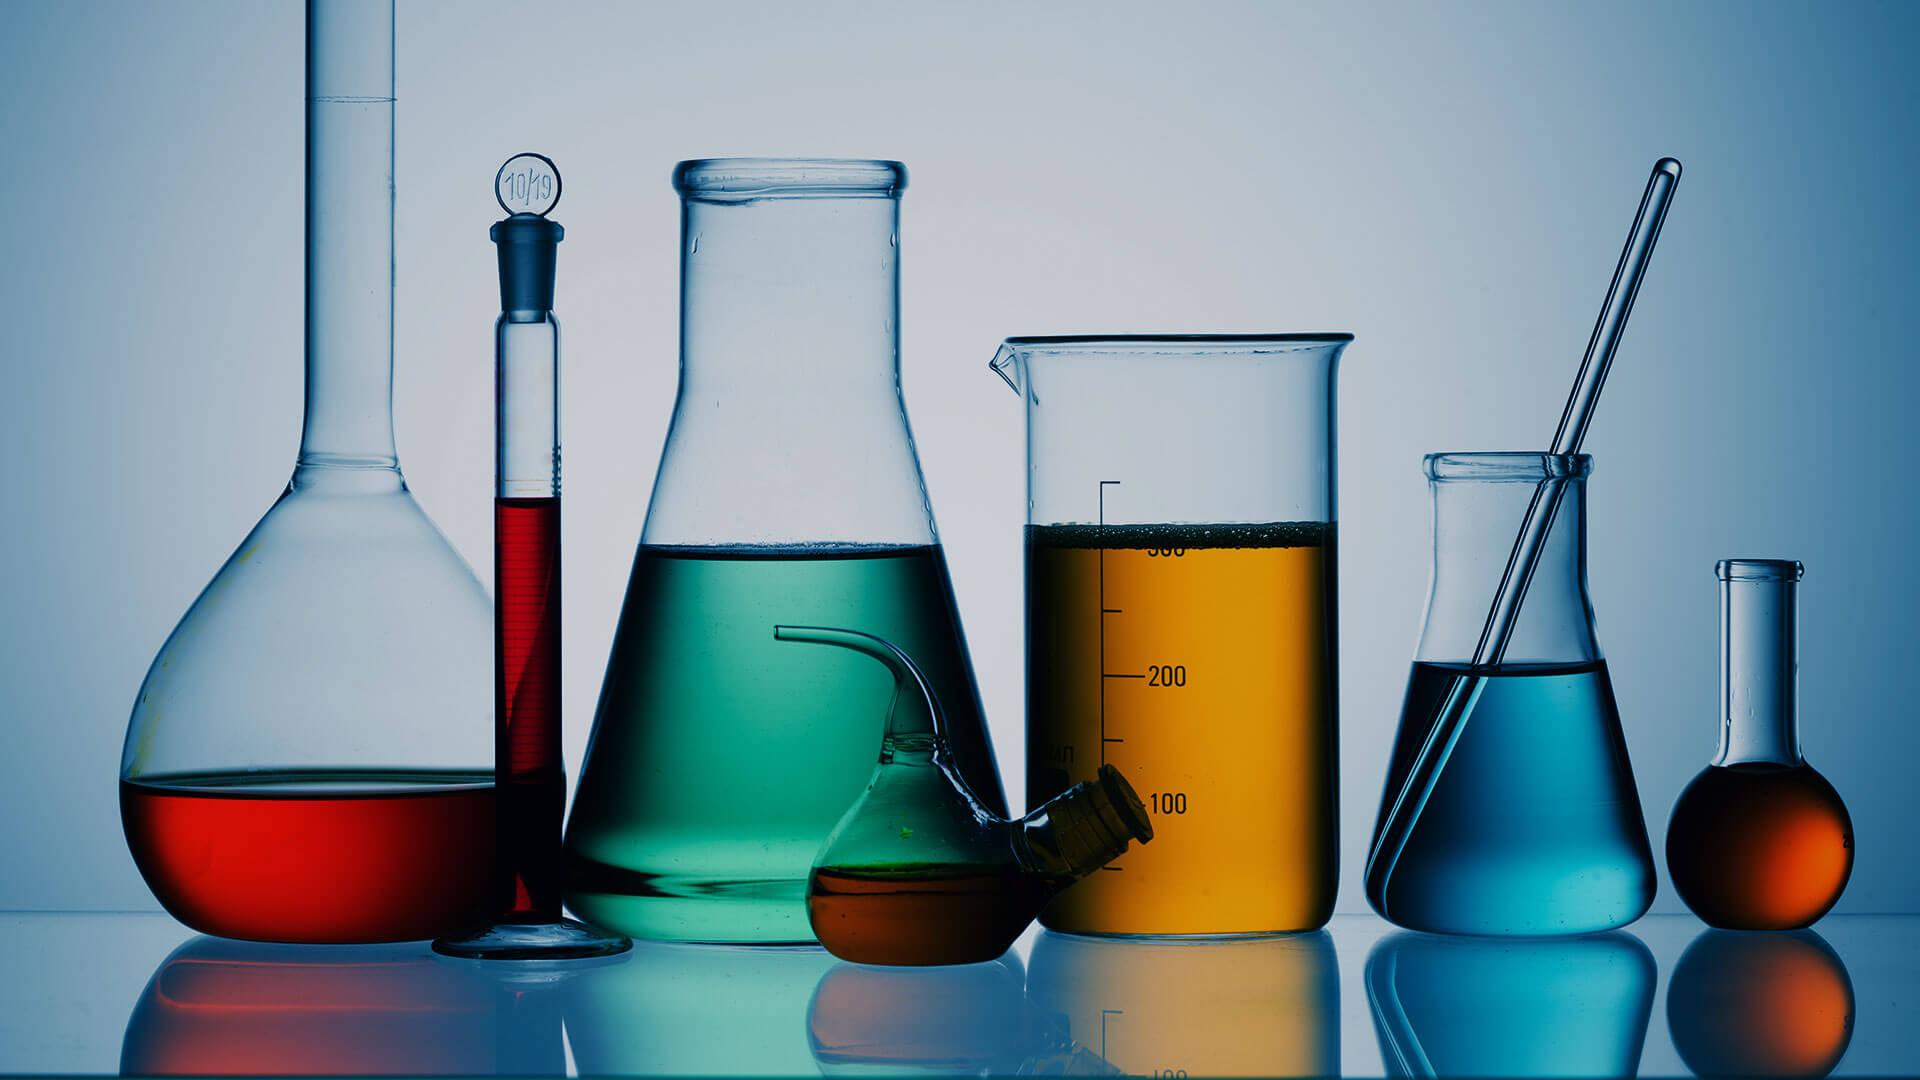 laboratorio-prueba-experimento-ss-1920